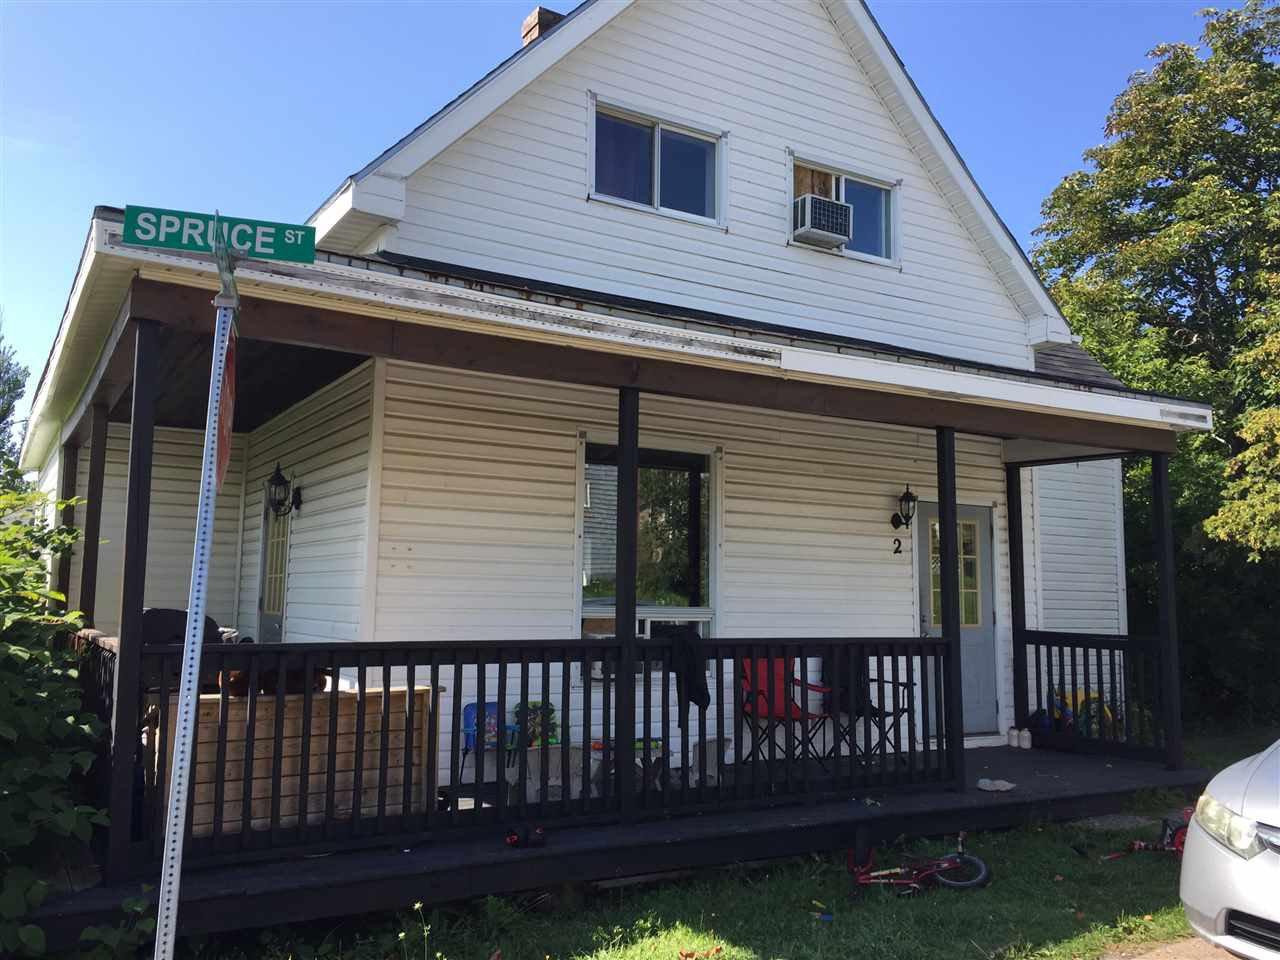 Main Photo: 21 Spruce Street in Trenton: 107-Trenton,Westville,Pictou Multi-Family for sale (Northern Region)  : MLS®# 202018518